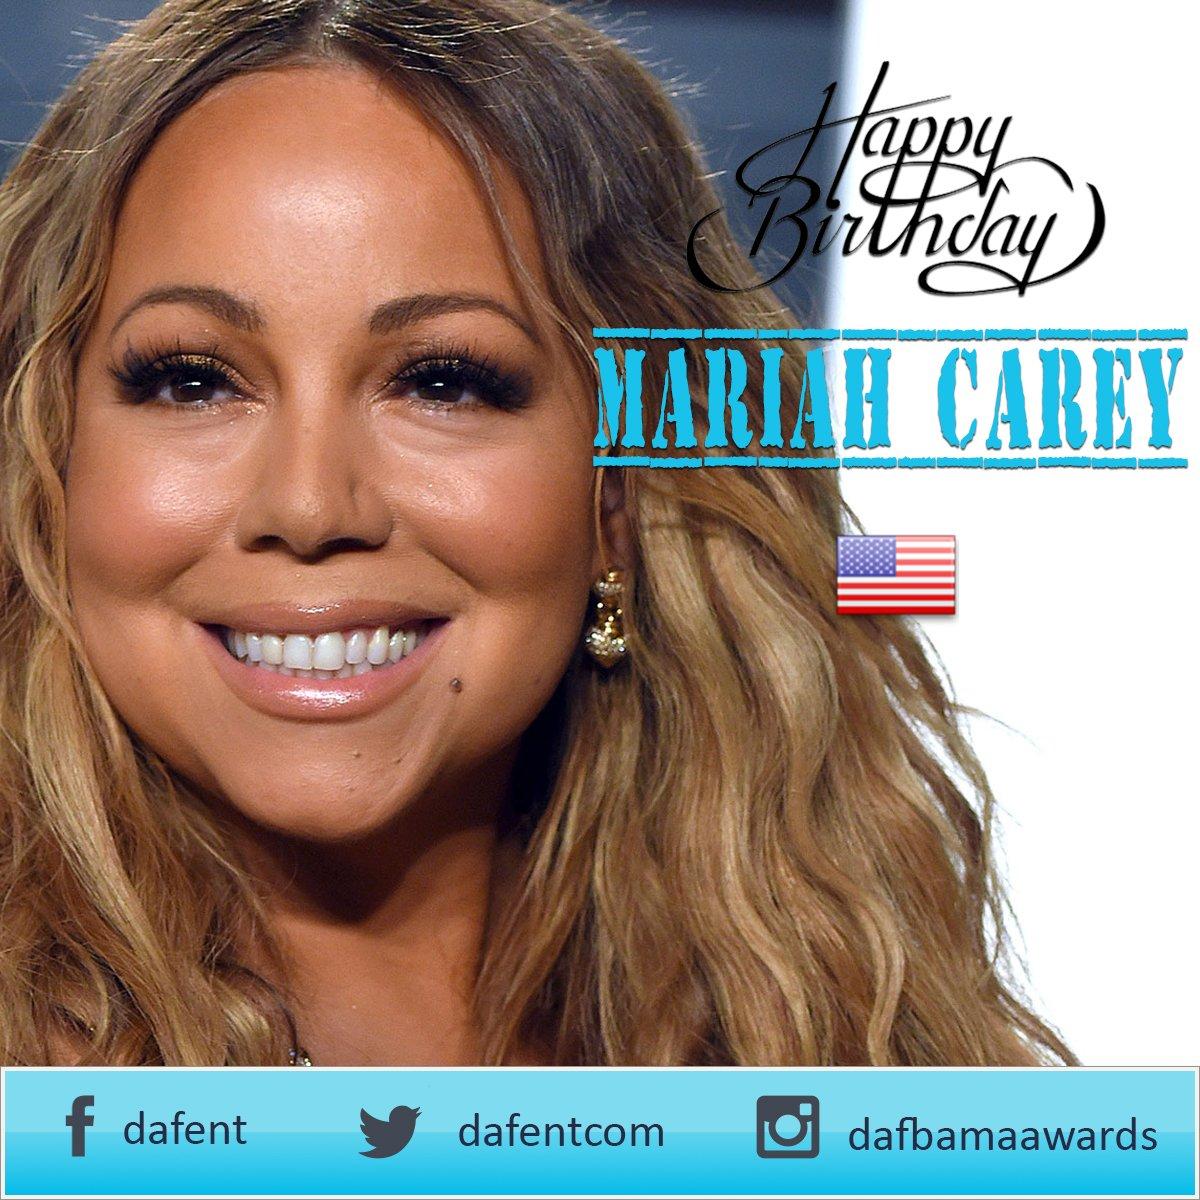 Happy birthday, Mariah Carey.